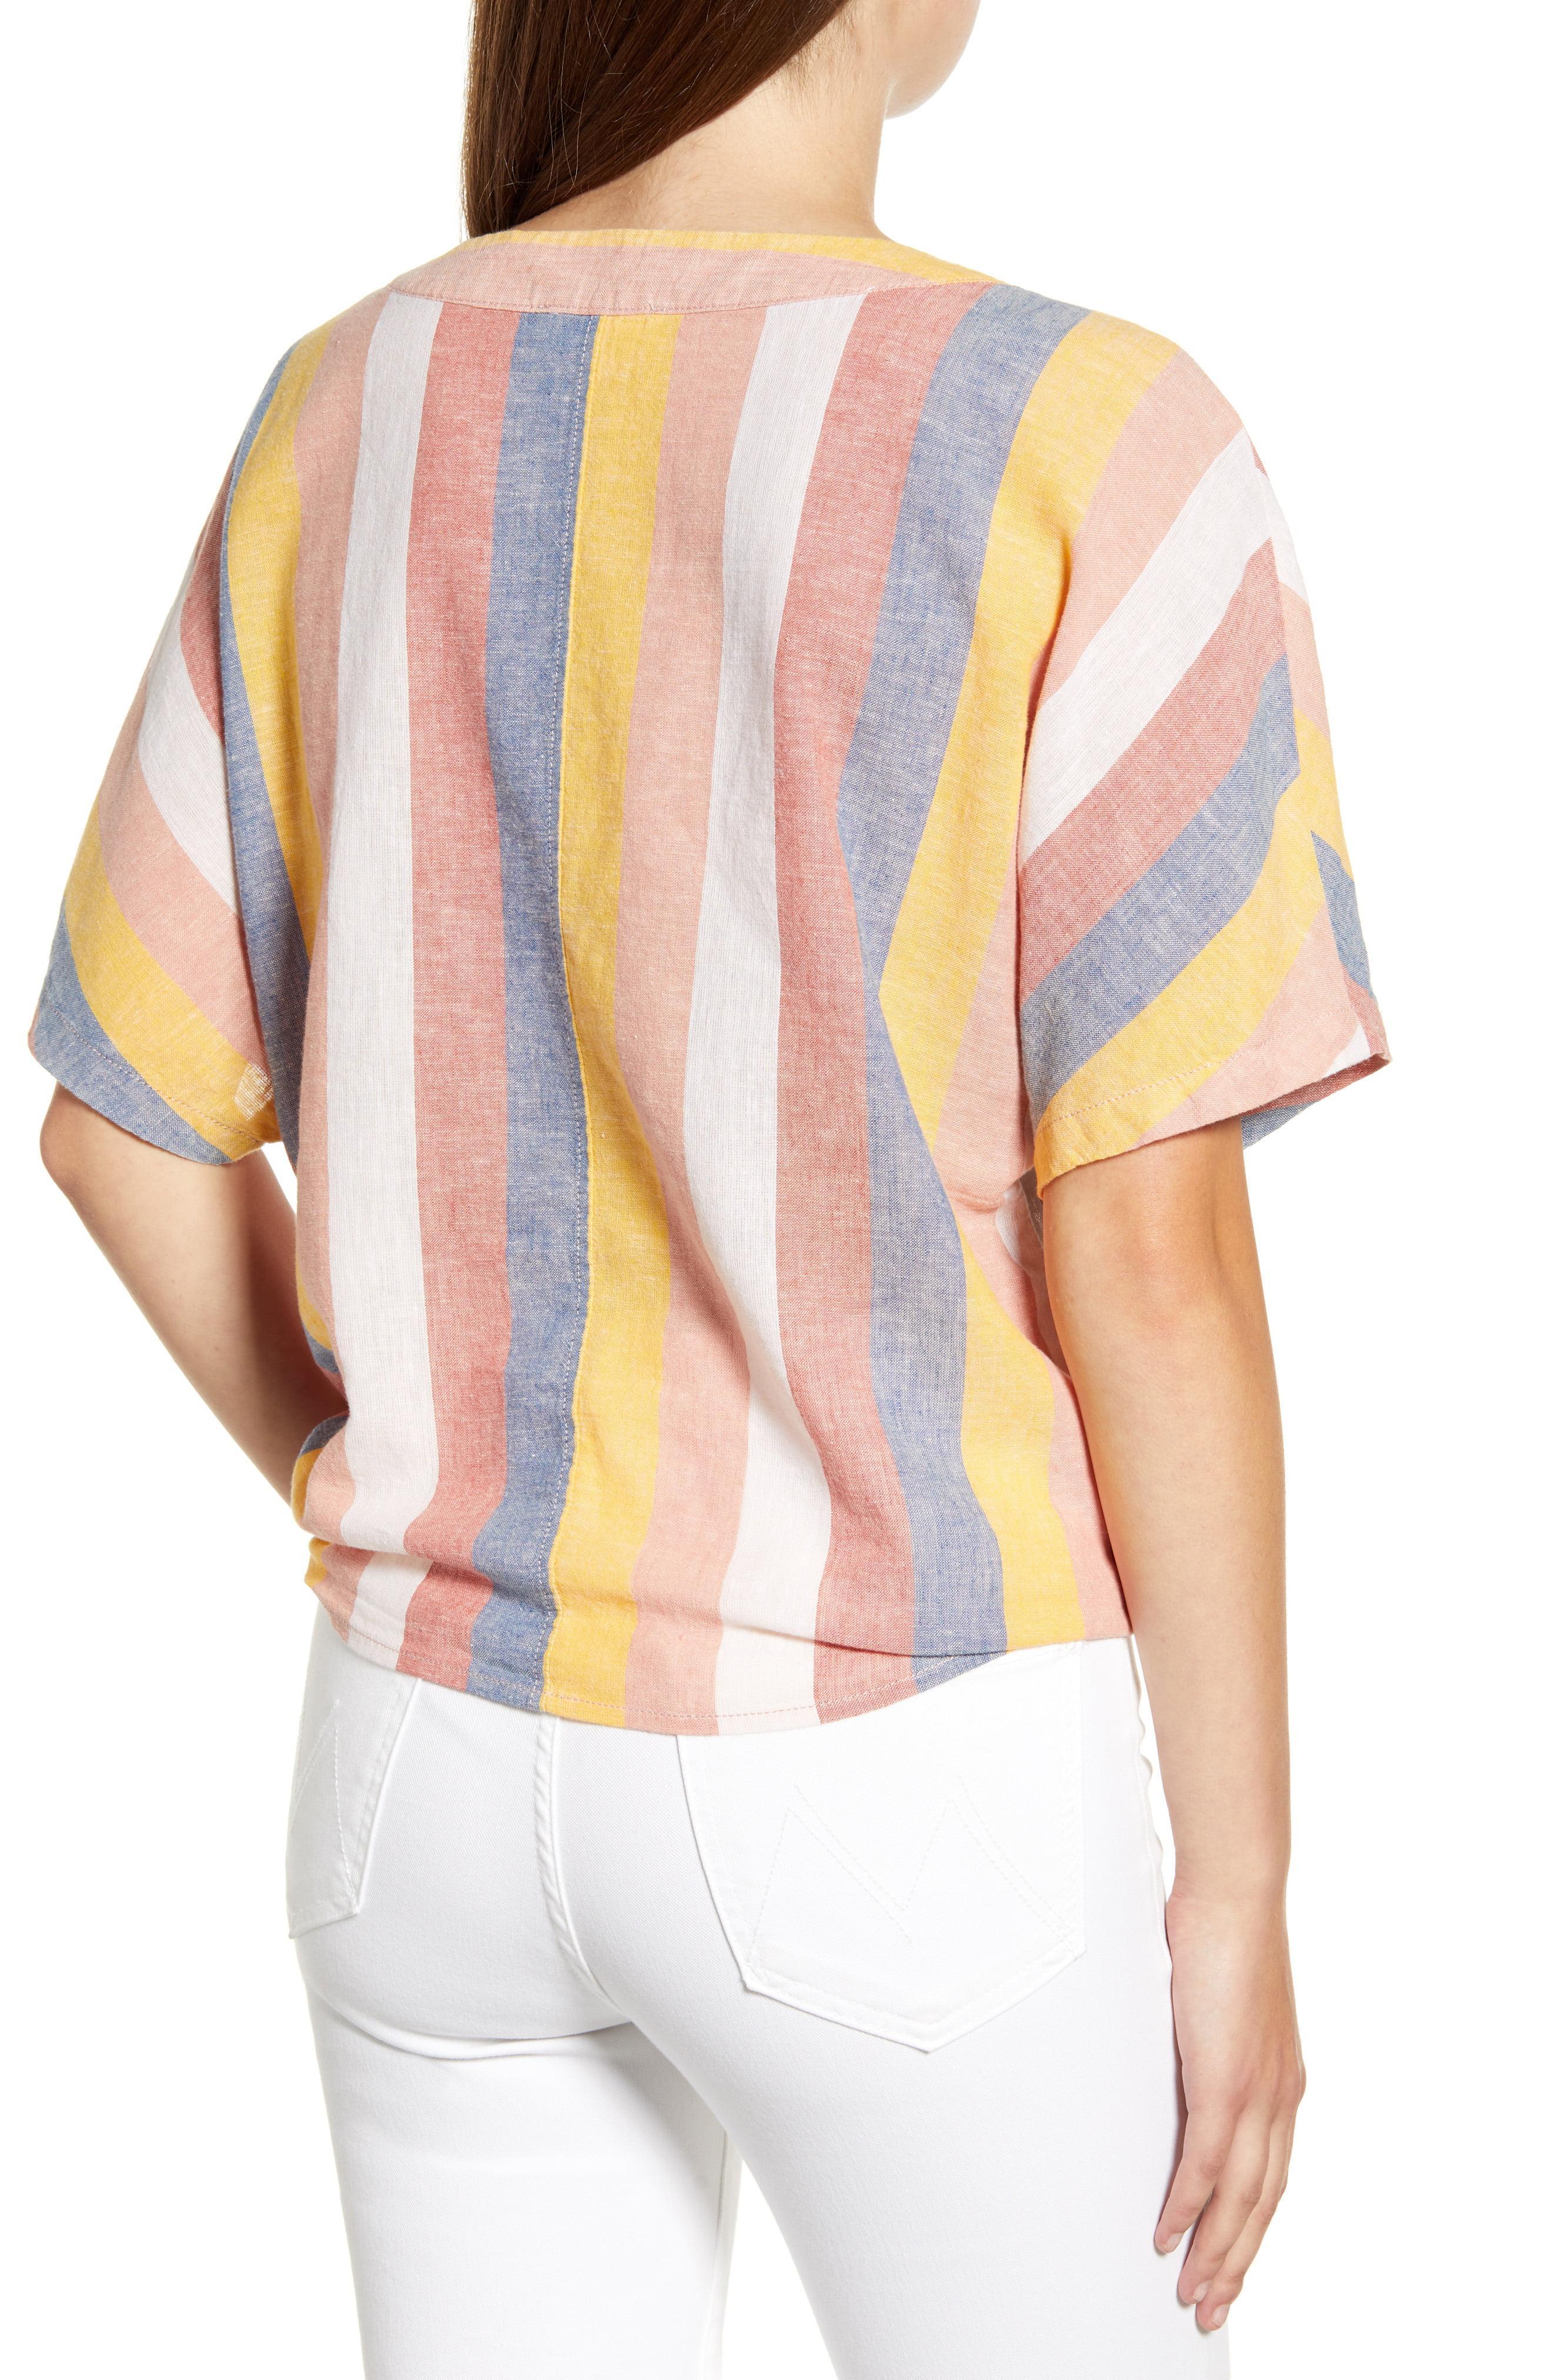 babb5e47f8 Beach Lunch Lounge - Multicolor Kelli Stripe Tie Front Linen & Cotton Blouse  - Lyst. View fullscreen